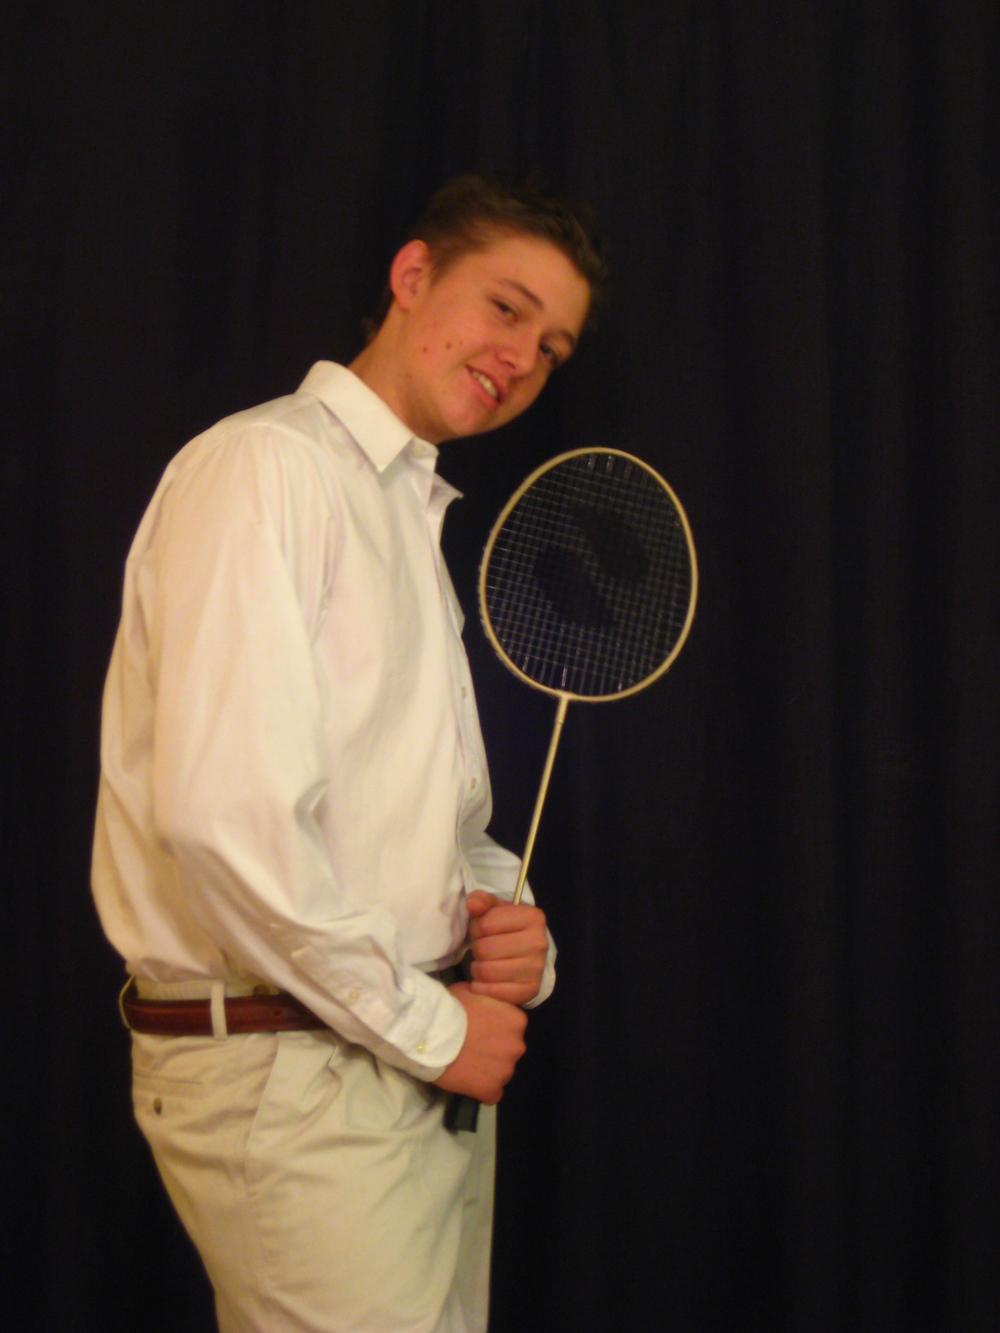 badminton6.jpg